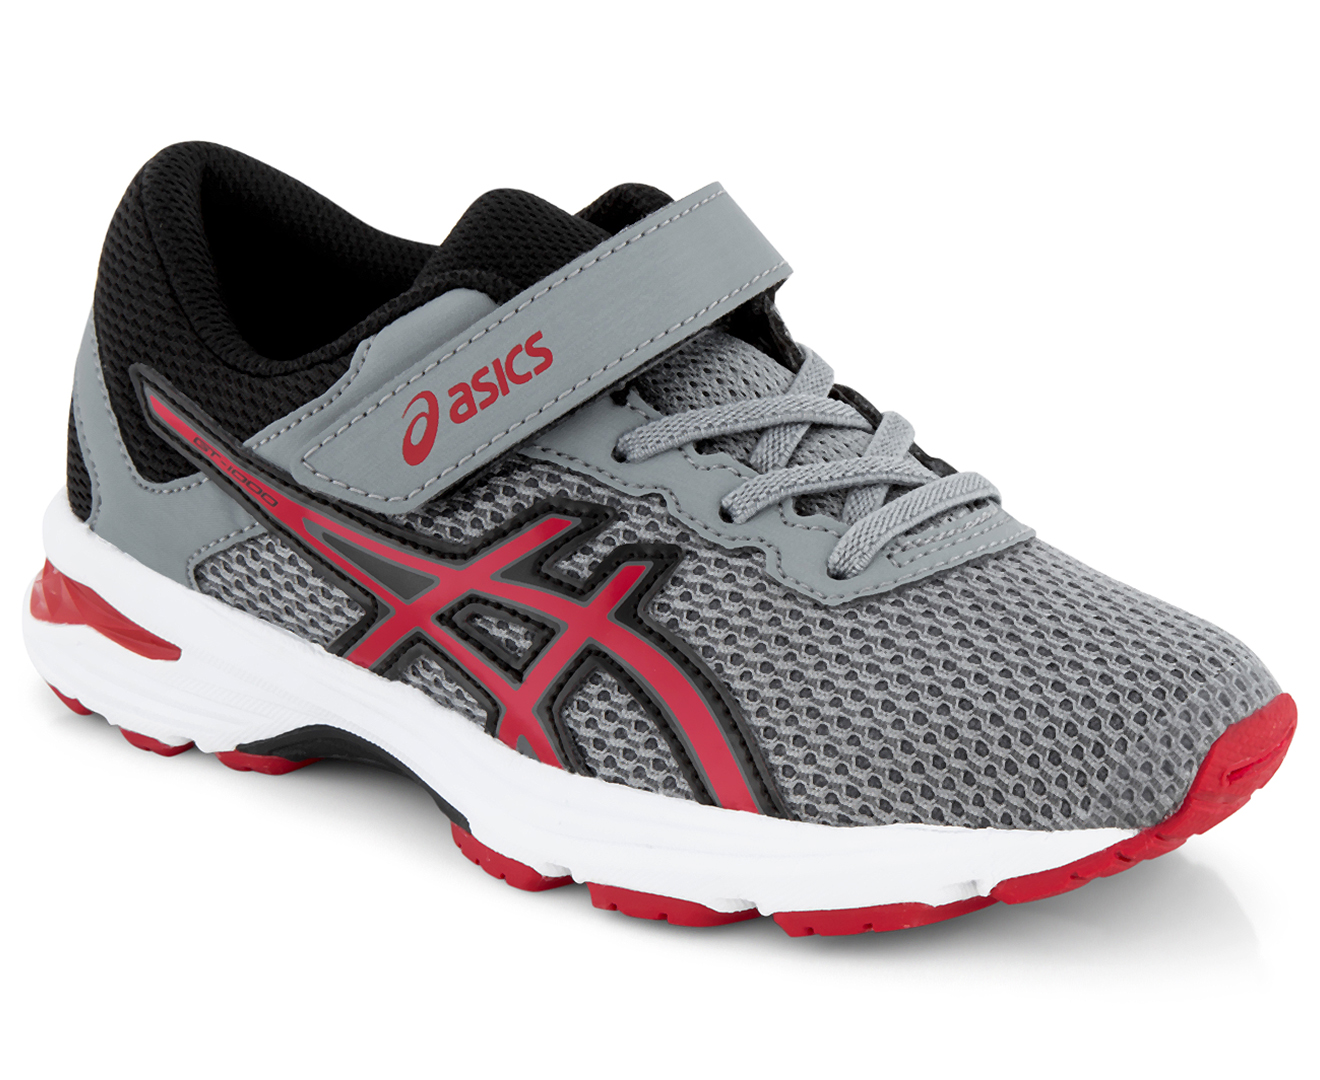 Asics Shock Absorbing Running Shoes